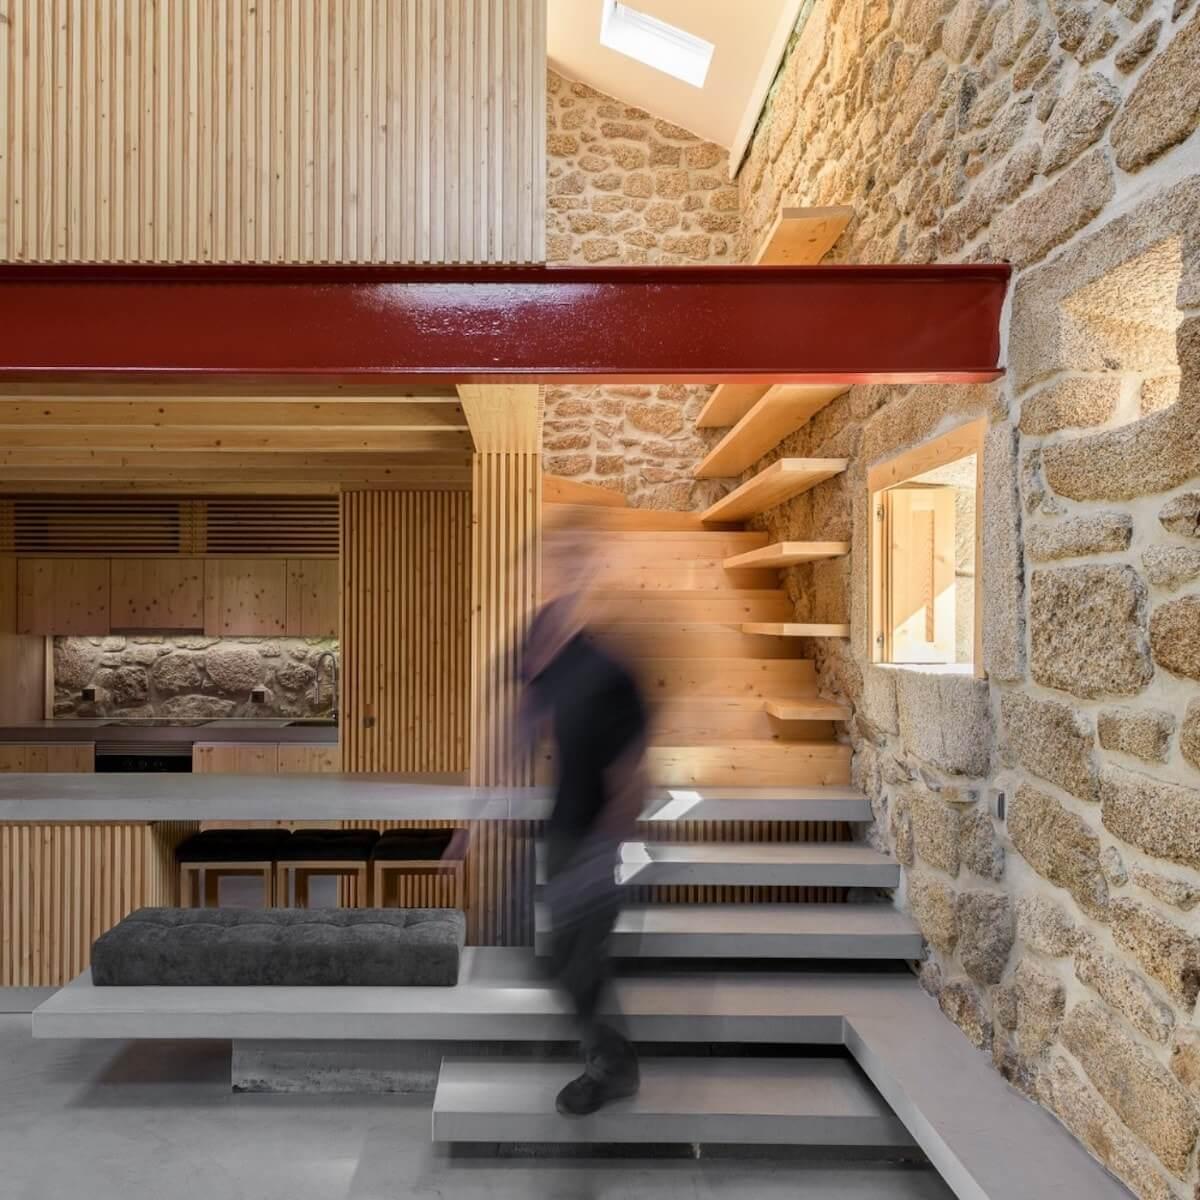 Arquitetura: Henrique Barros-Gomes Architects .  Projeto: Rural House in Portugal .  Fotografia: ©Ricardo Oliveira Alves